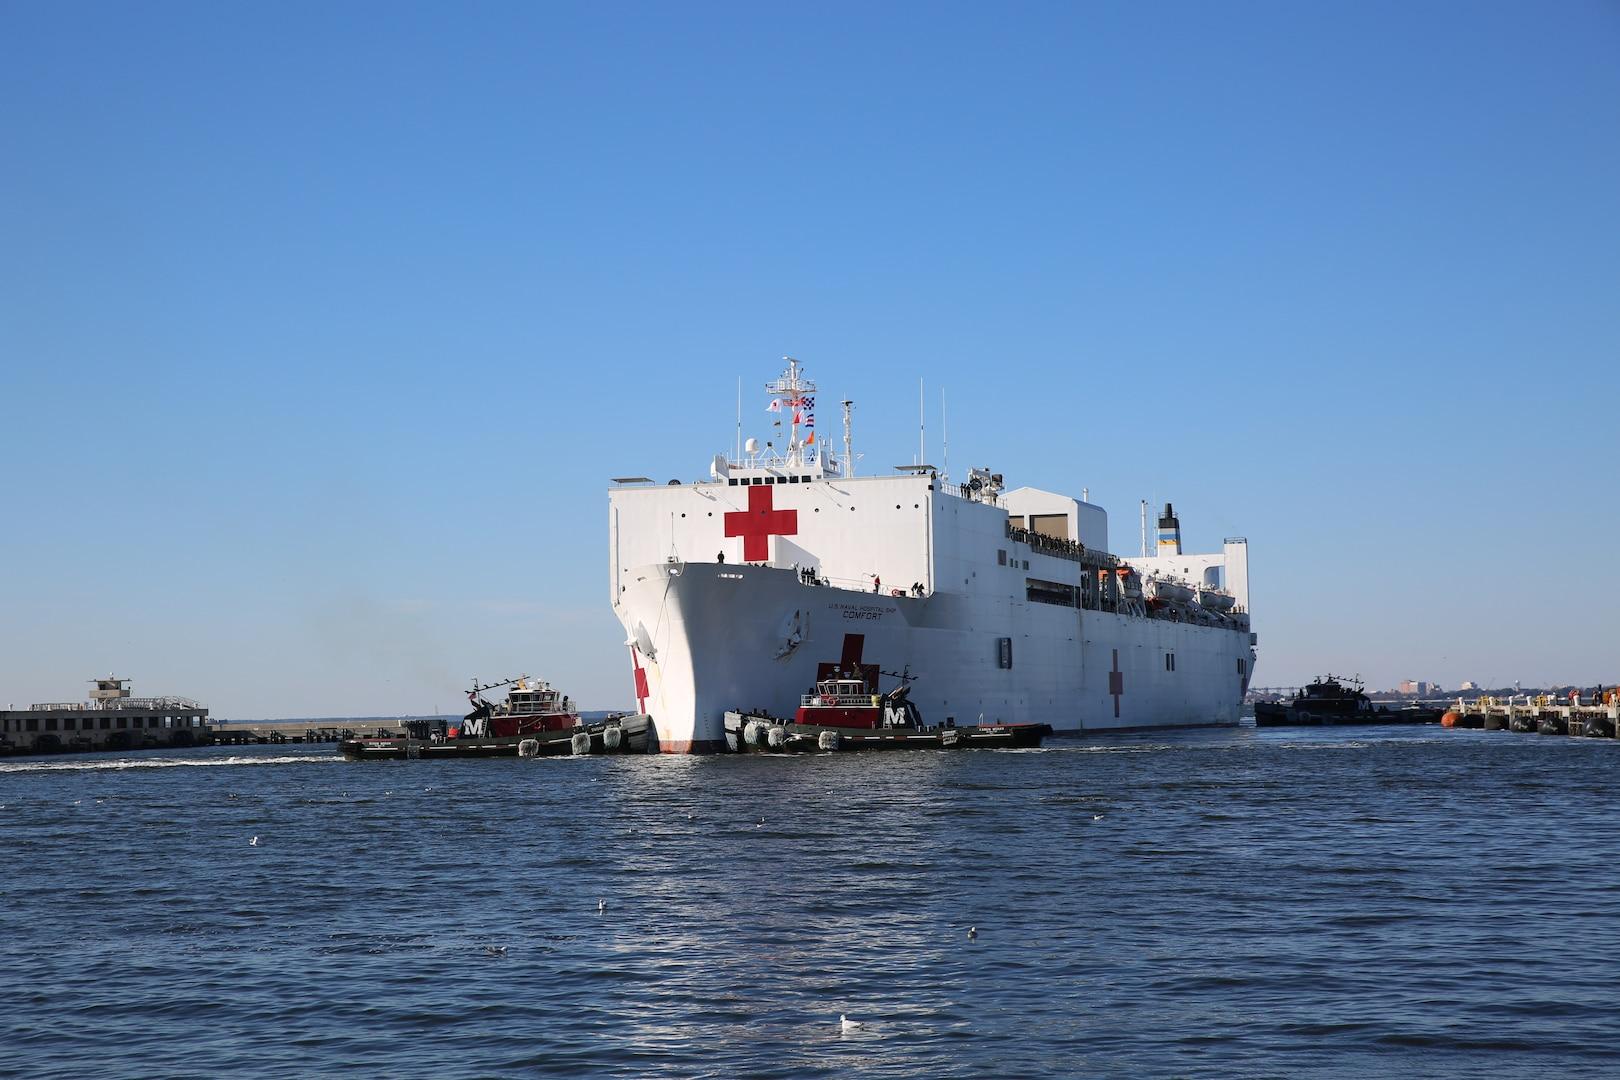 Military Sealift Command's hospital ship USNS Comfort (T-AH 20) pulls into Naval Station Norfolk, Dec. 18.